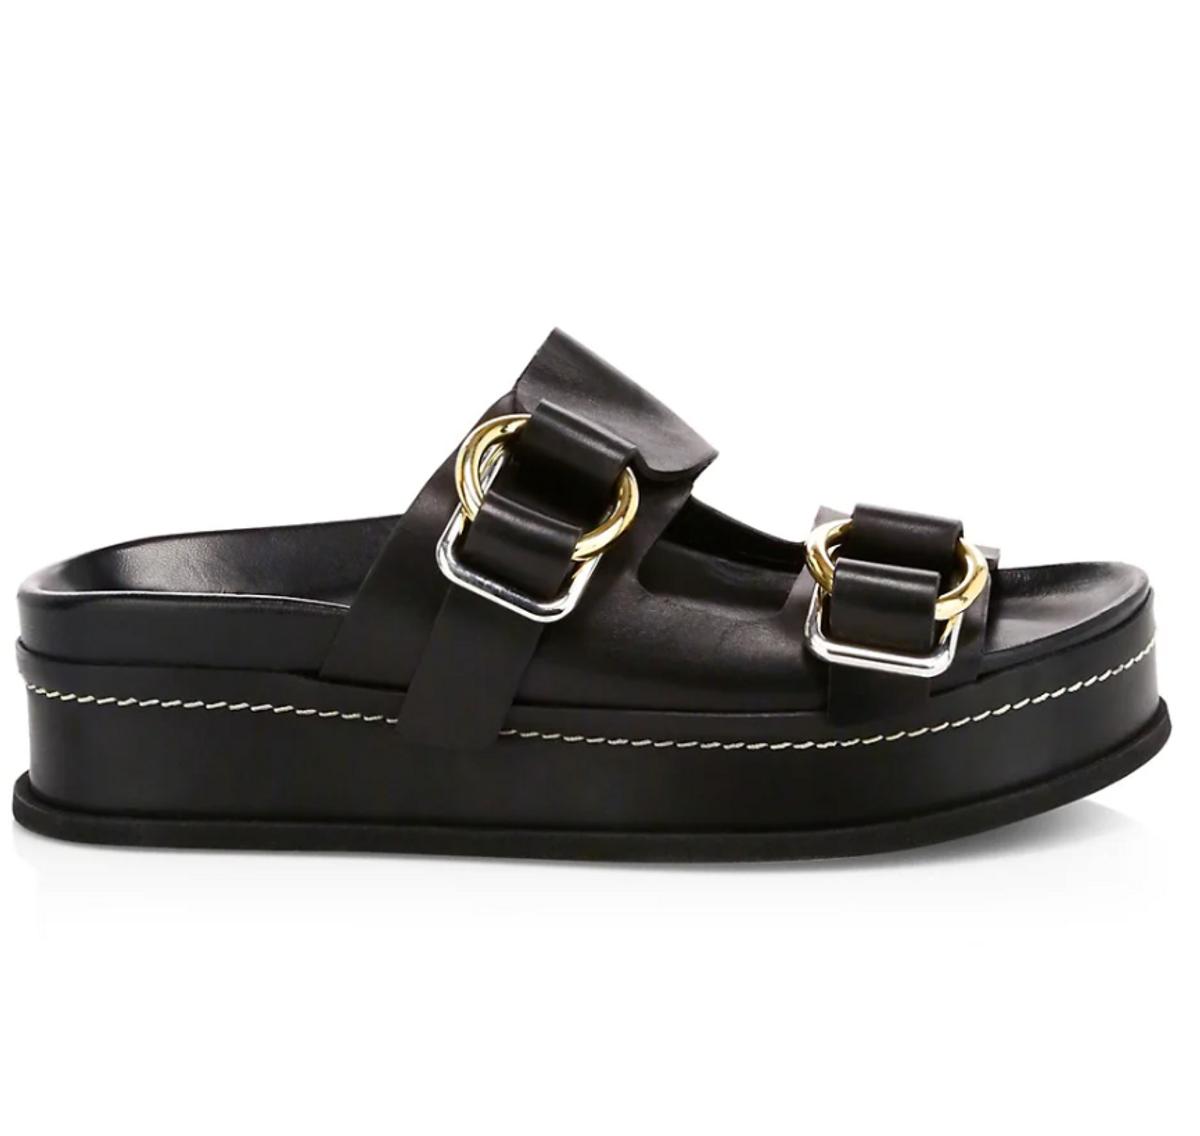 Freida Buckle Leather Flatform Sandals